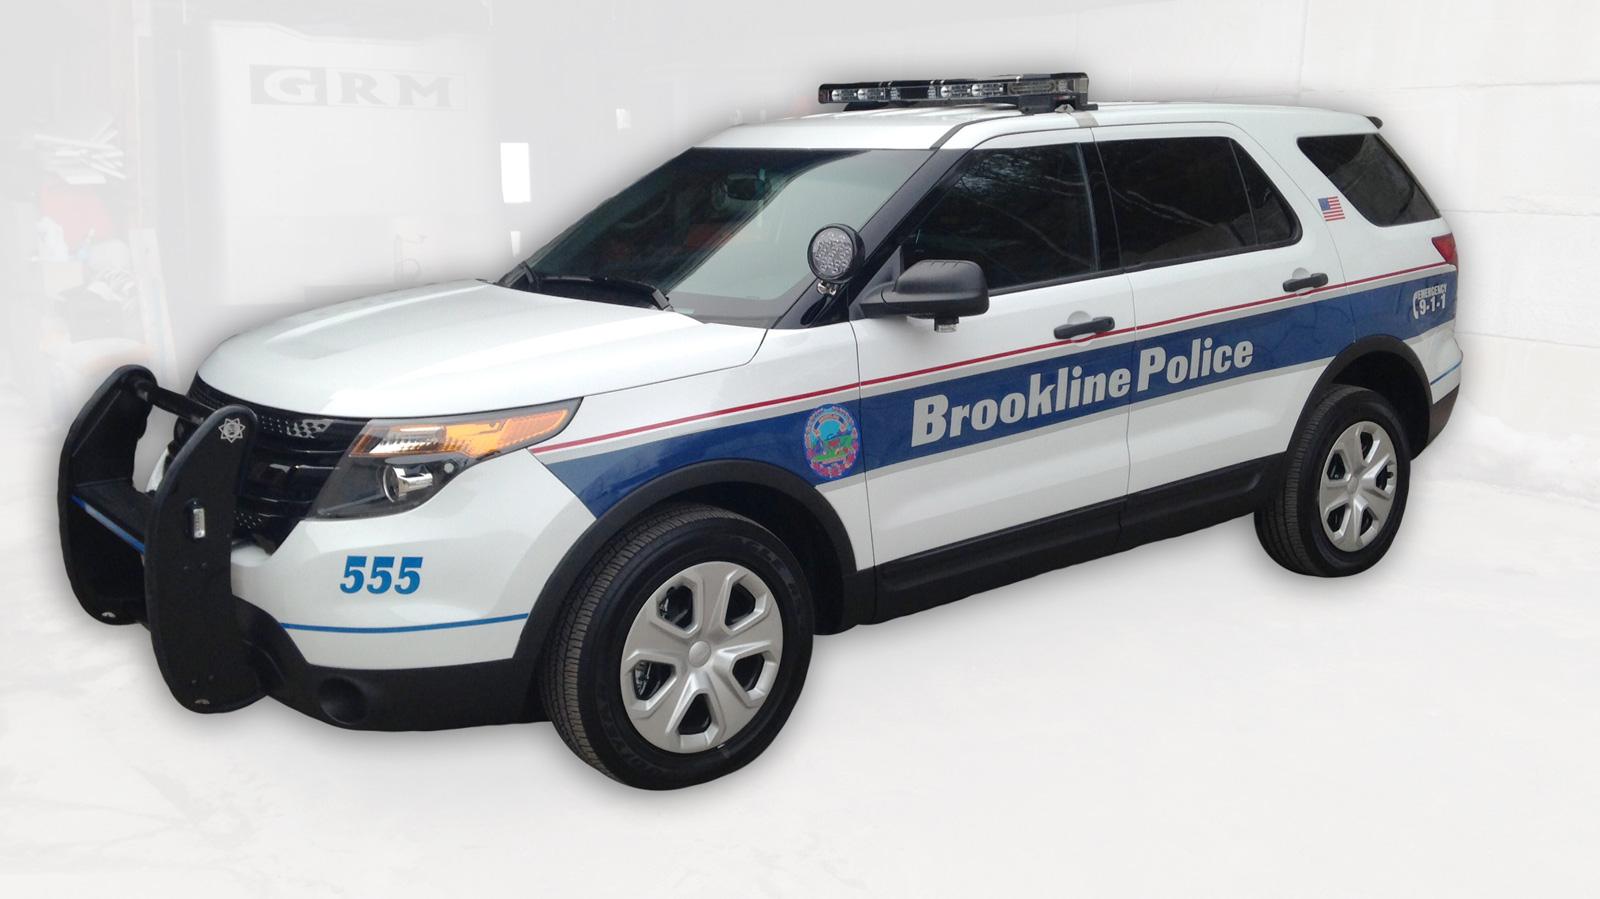 Brookline PD